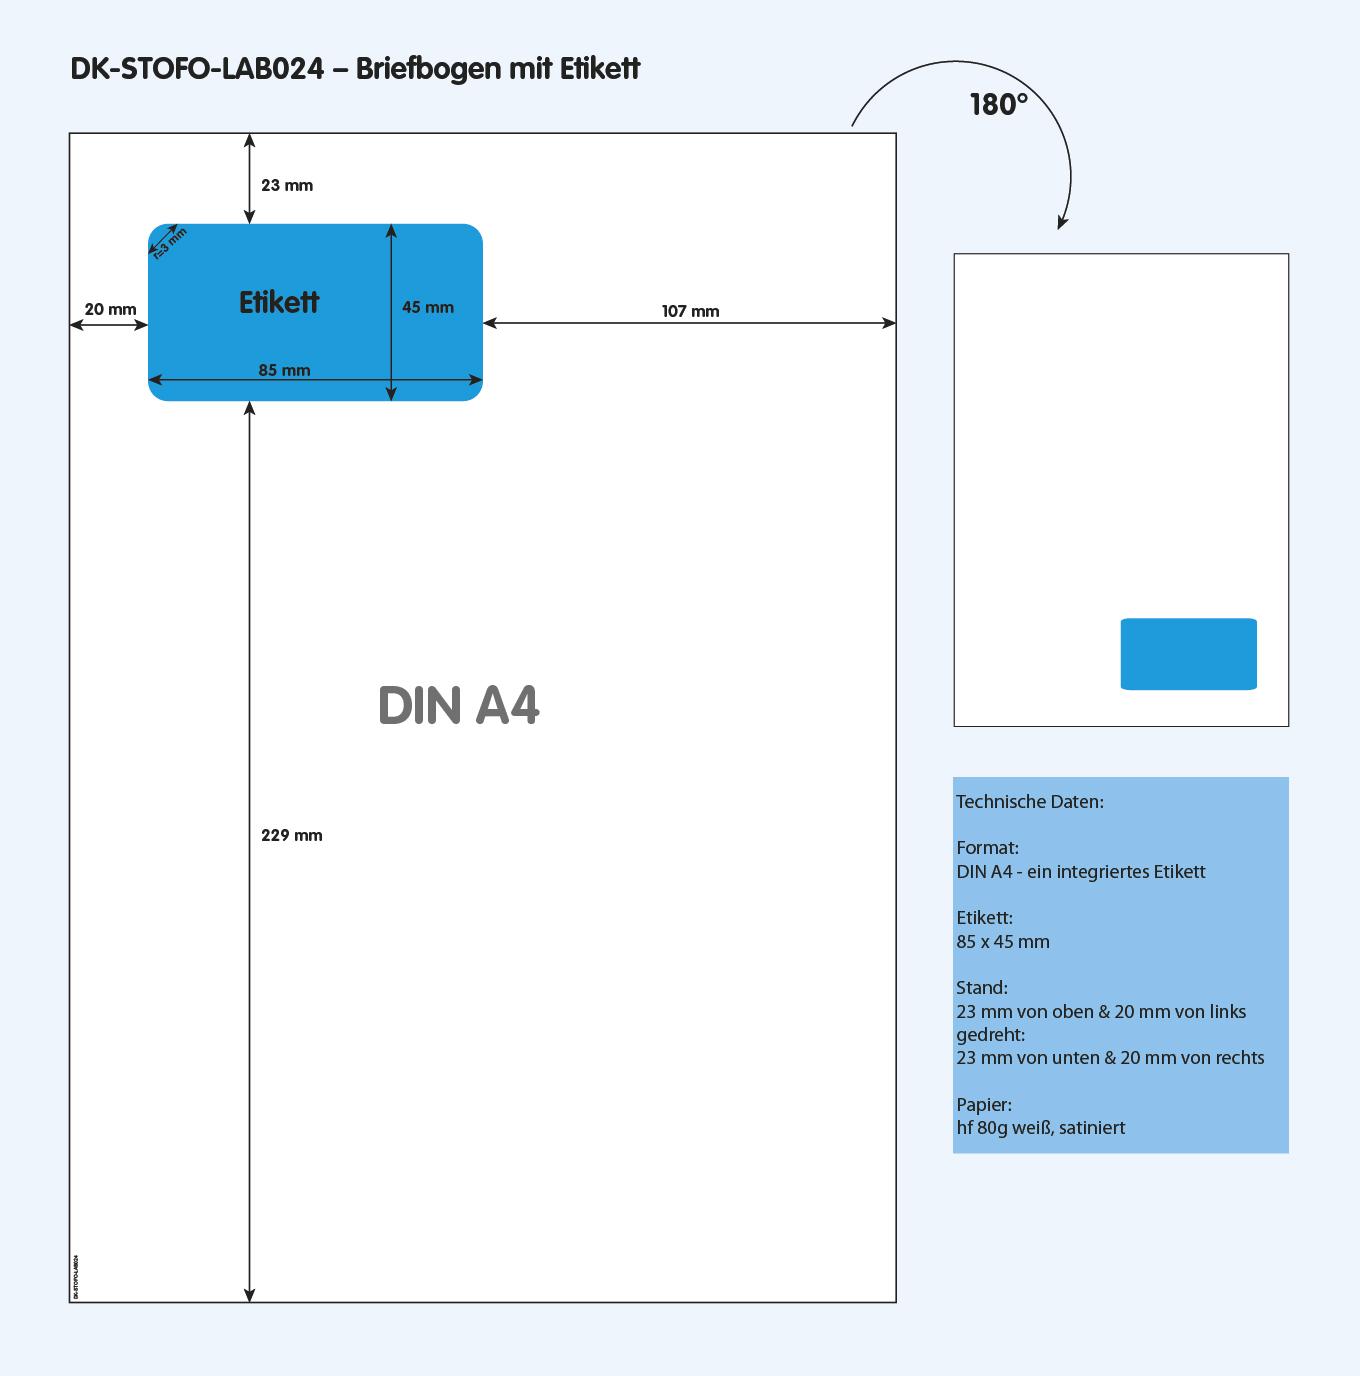 DK-STOFO-LAB024